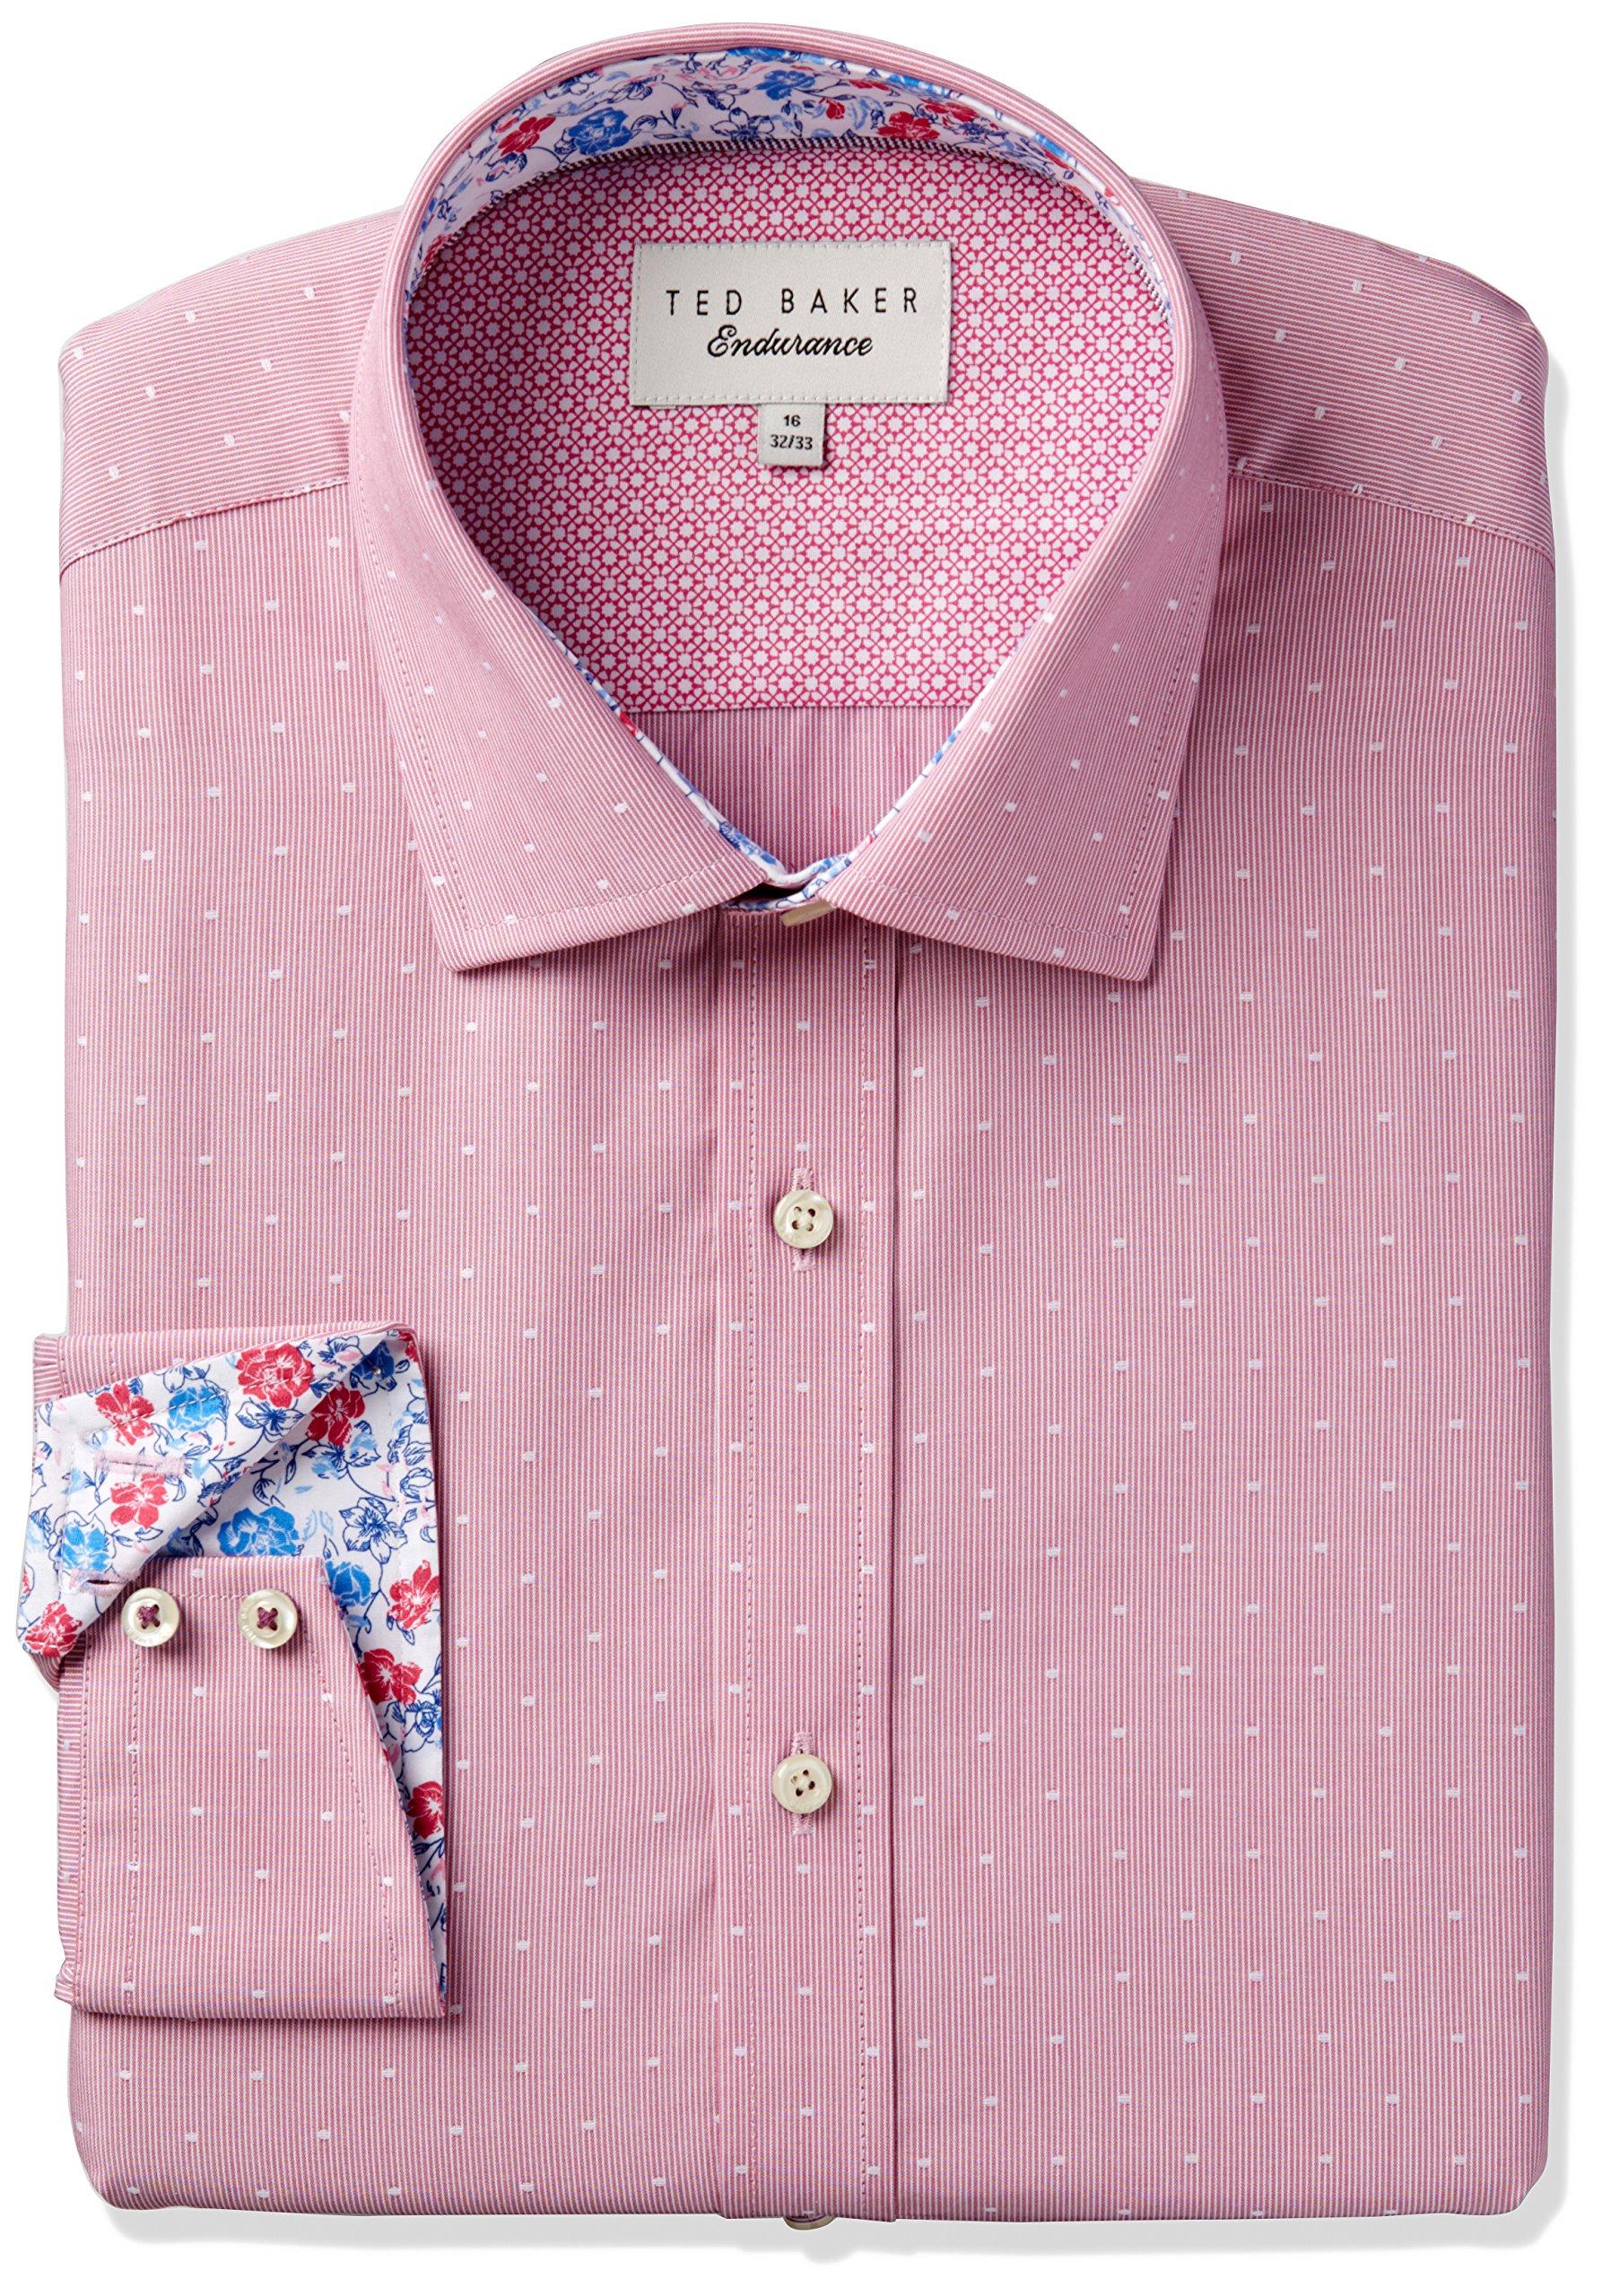 Ted Baker Men's Slim Fit Crete Dobby Dot Dress Shirt, Pink, 16'' Neck 34''-35'' Sleeve by Ted Baker